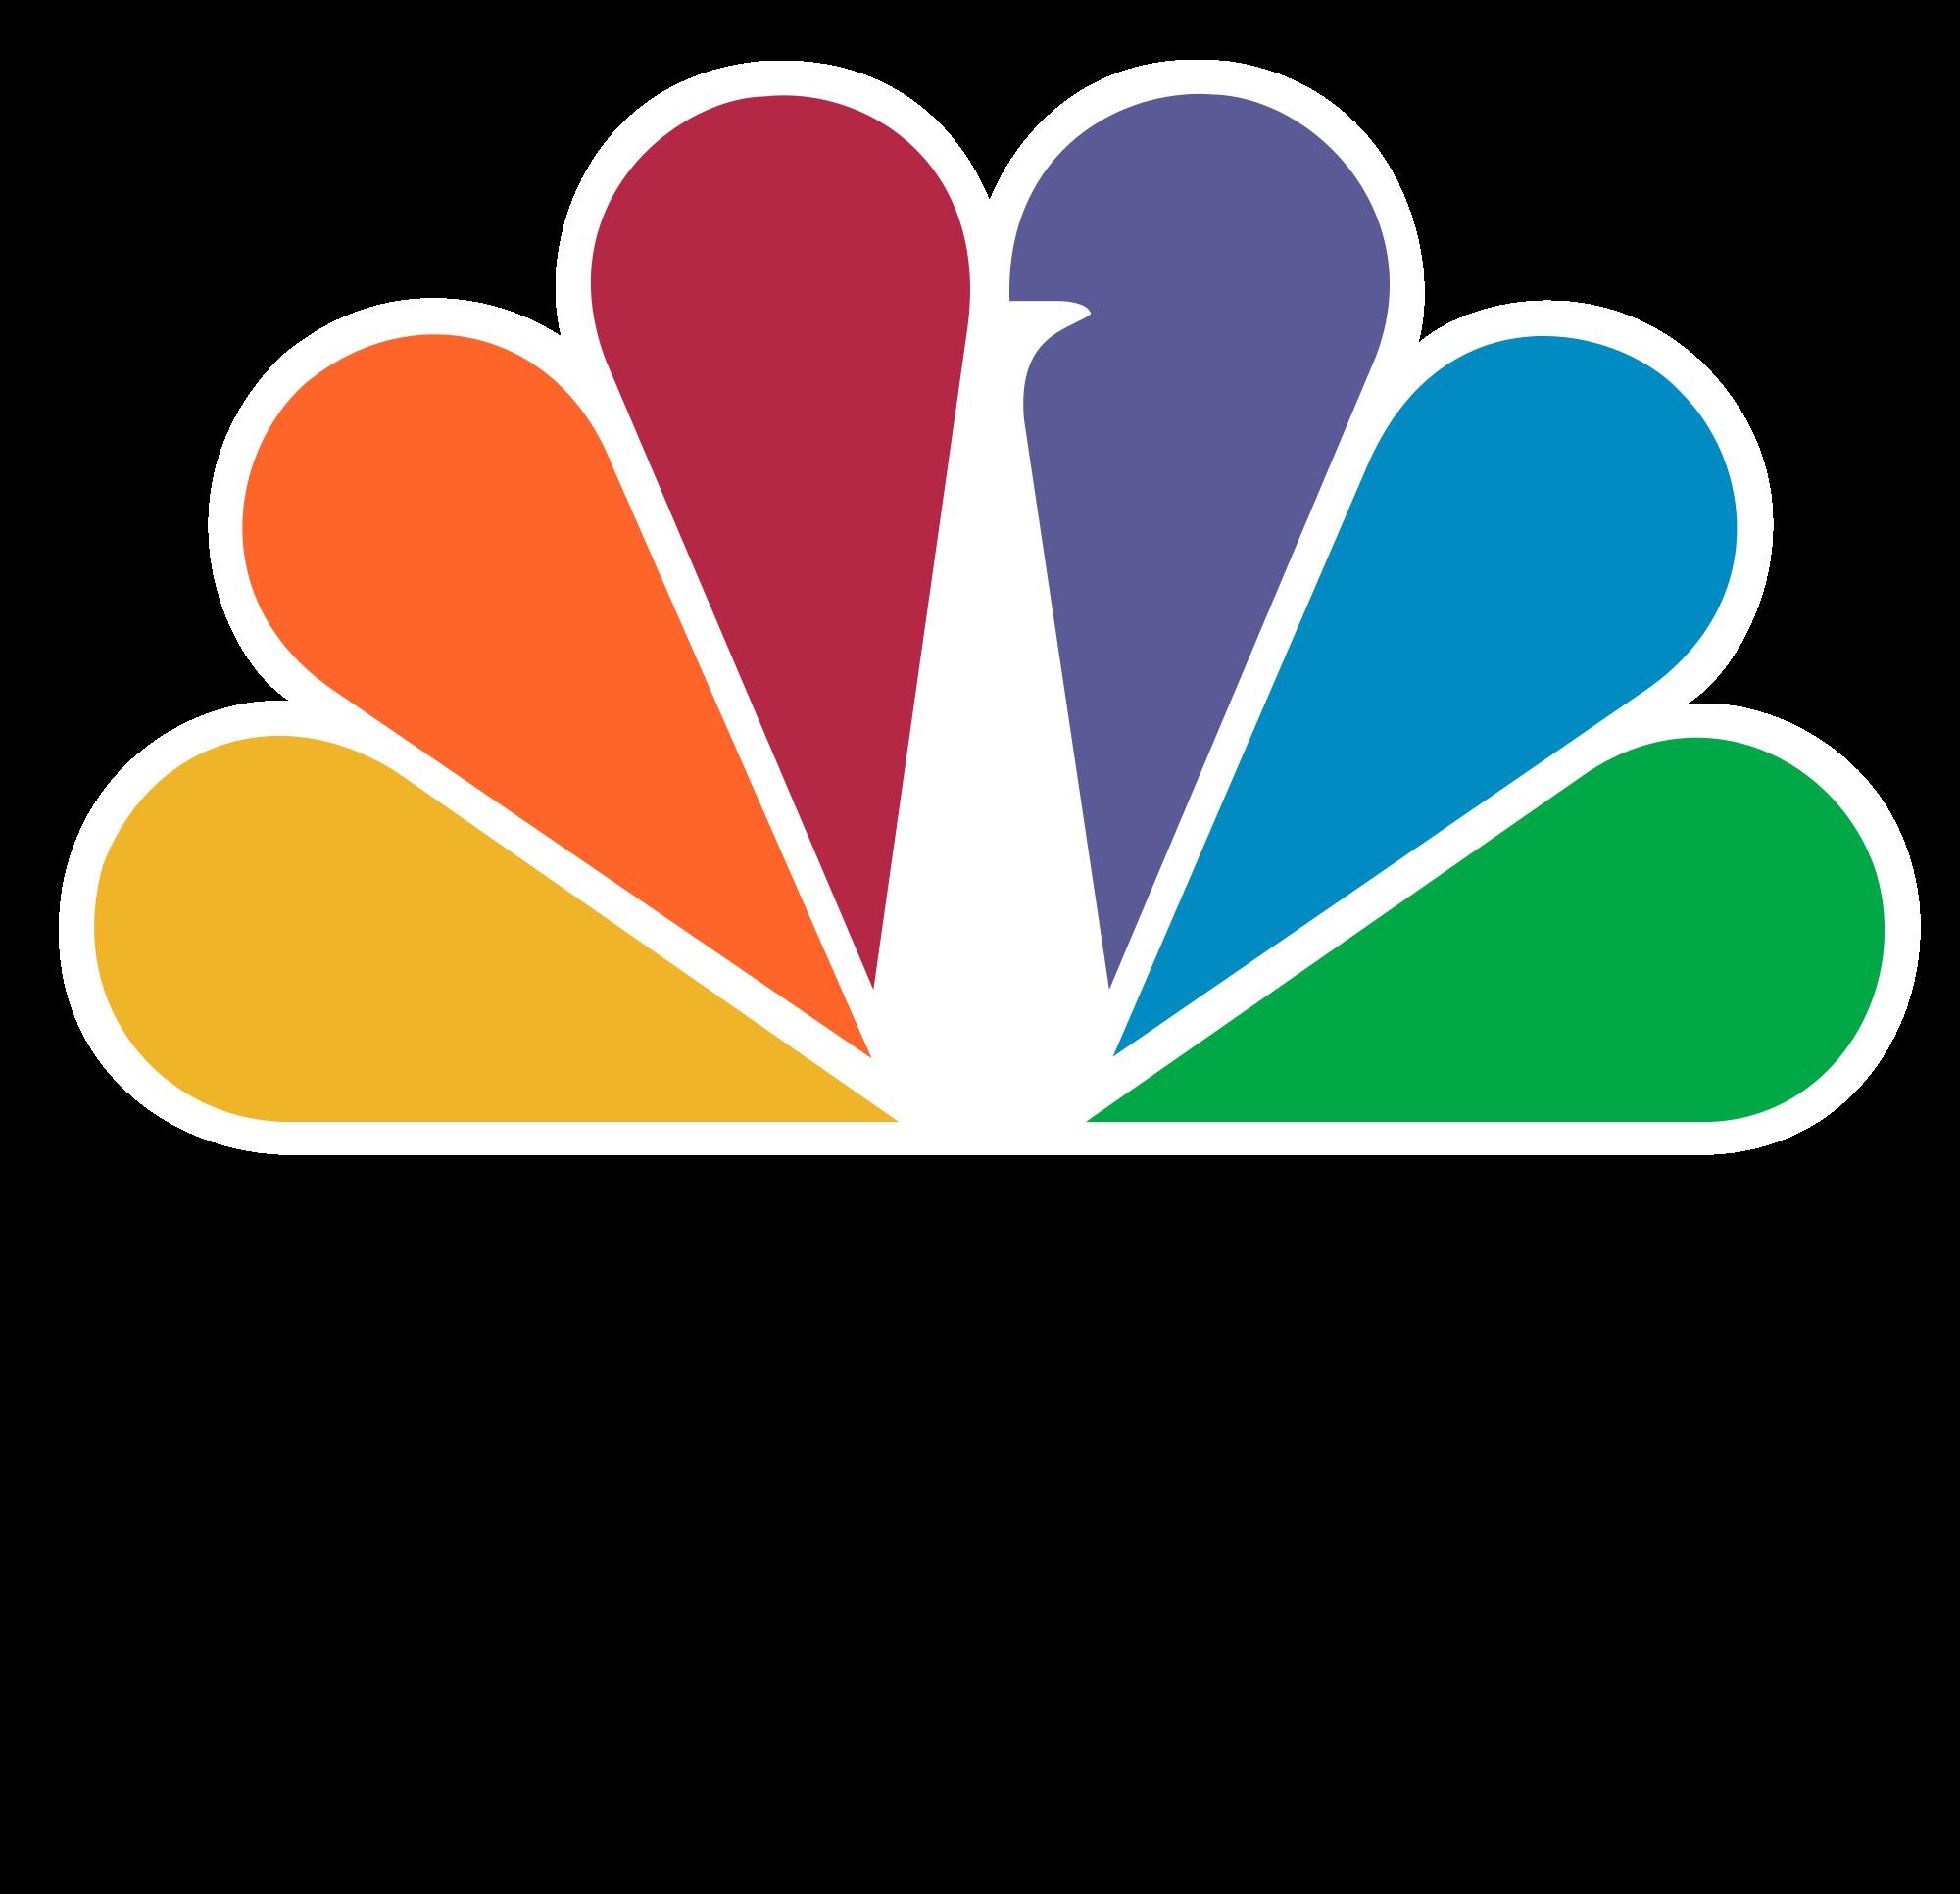 NBC logo Wallpaper